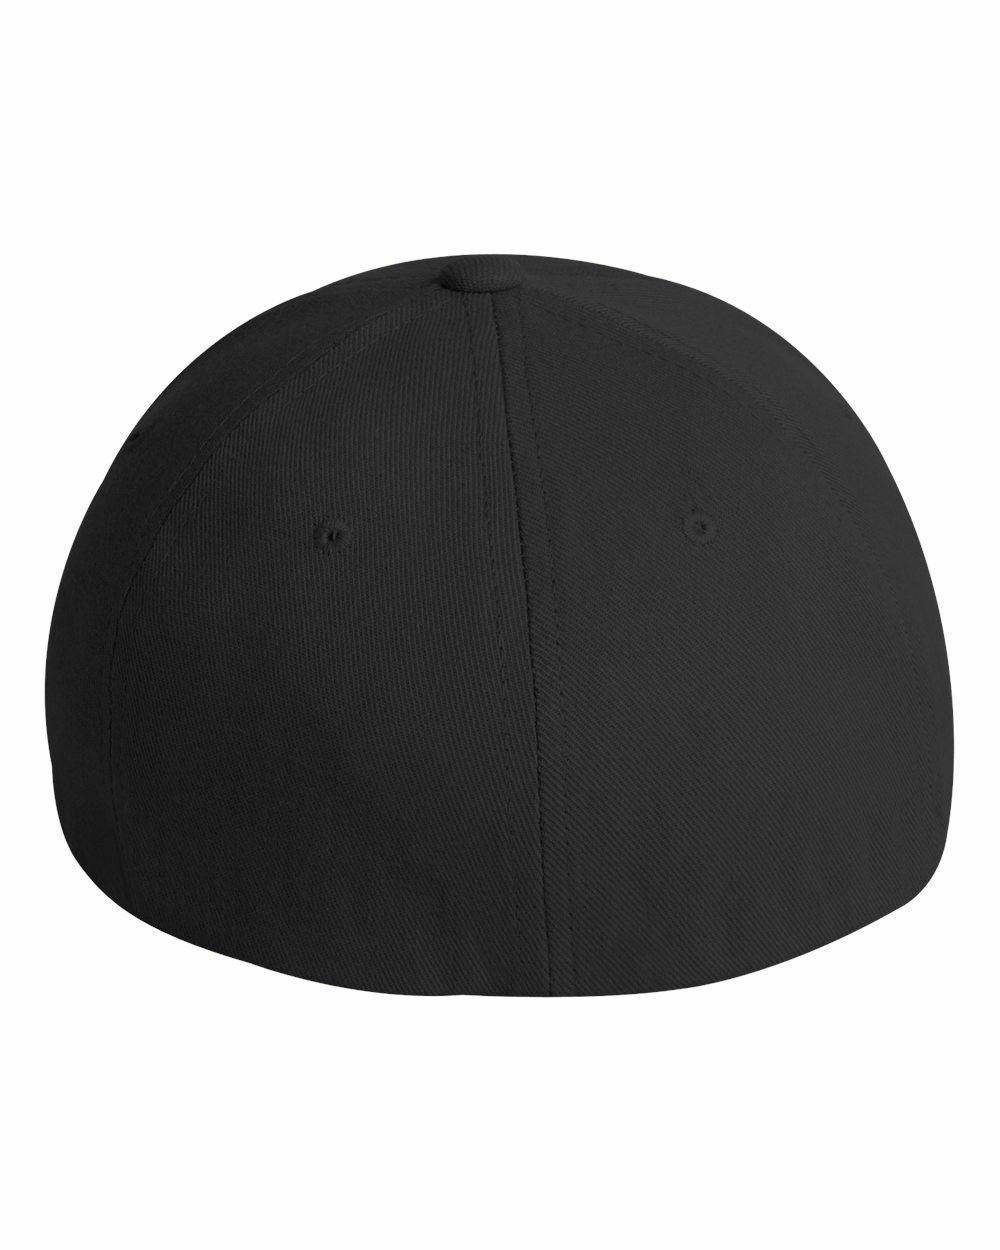 FLEXFIT Twill Hat FITTED 2XL Sport Baseball Cap 6277